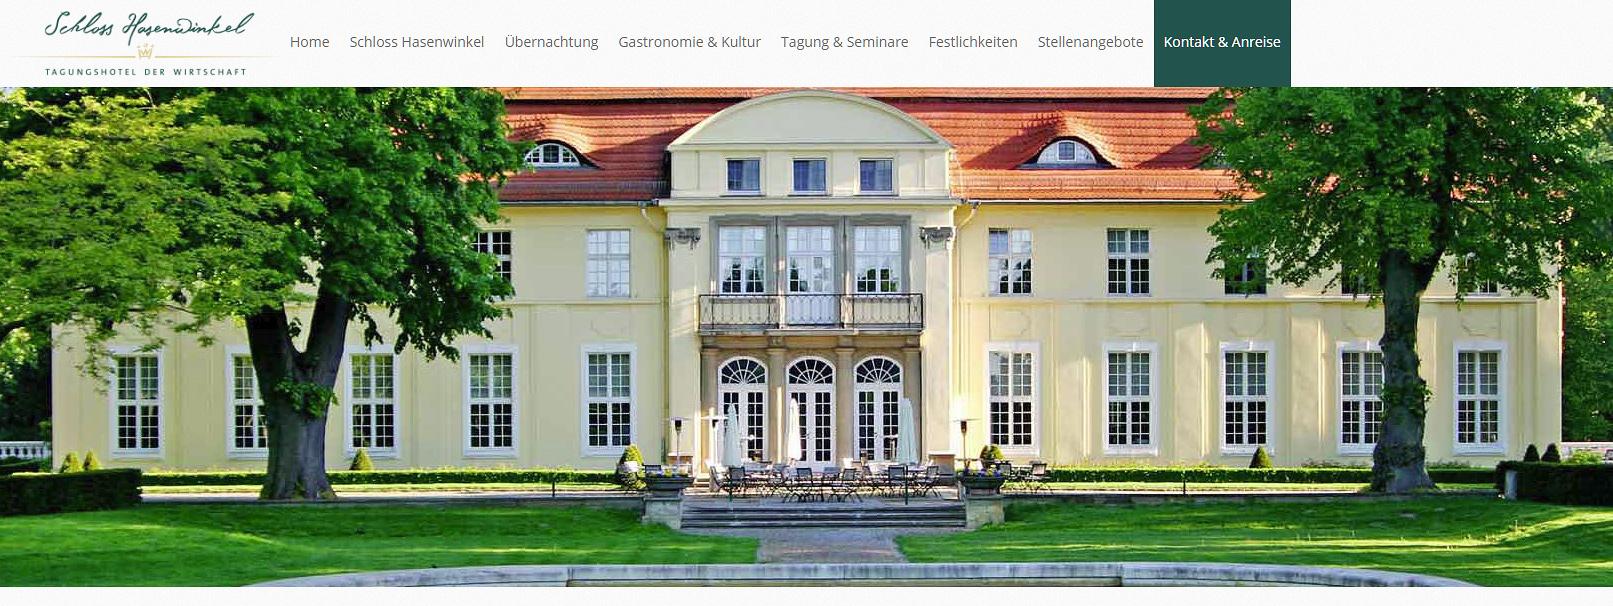 <span class='highlight'>Raumgestaltung</span> im Schlosshotel Hasenwinkel